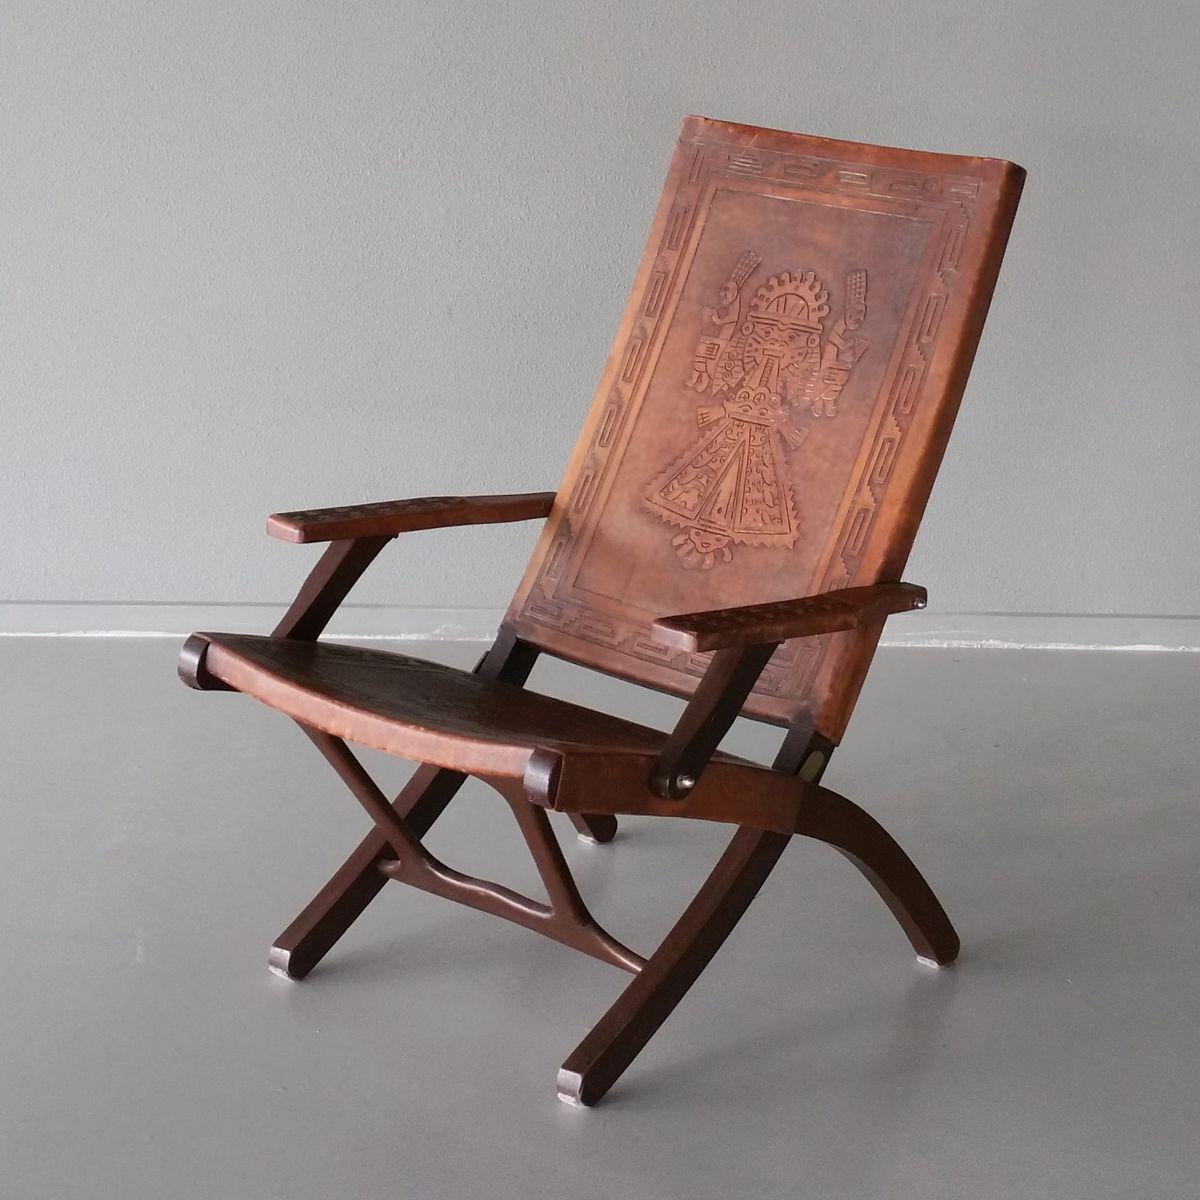 klappstuhl aus leder holz von angel pazmino f r muebles de estilo 1960er bei pamono kaufen. Black Bedroom Furniture Sets. Home Design Ideas